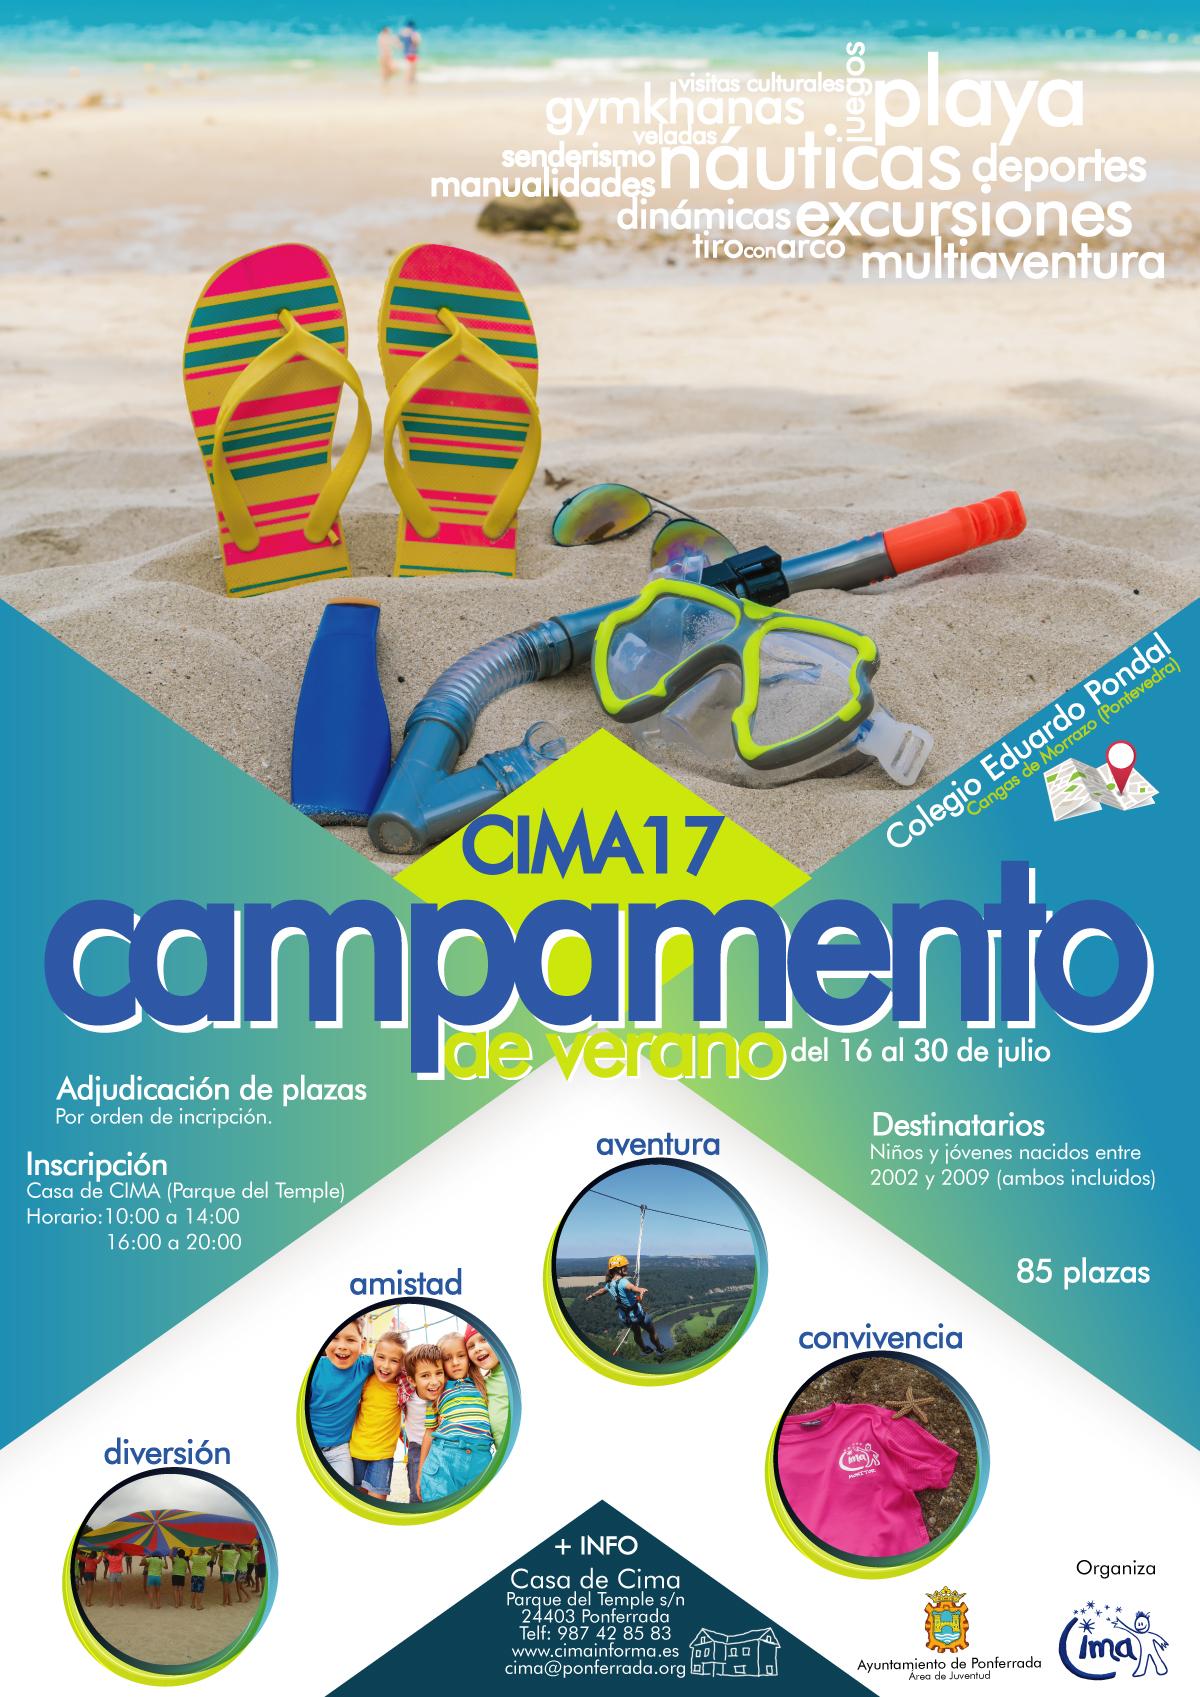 Campamento de Verano Cima 2017 2